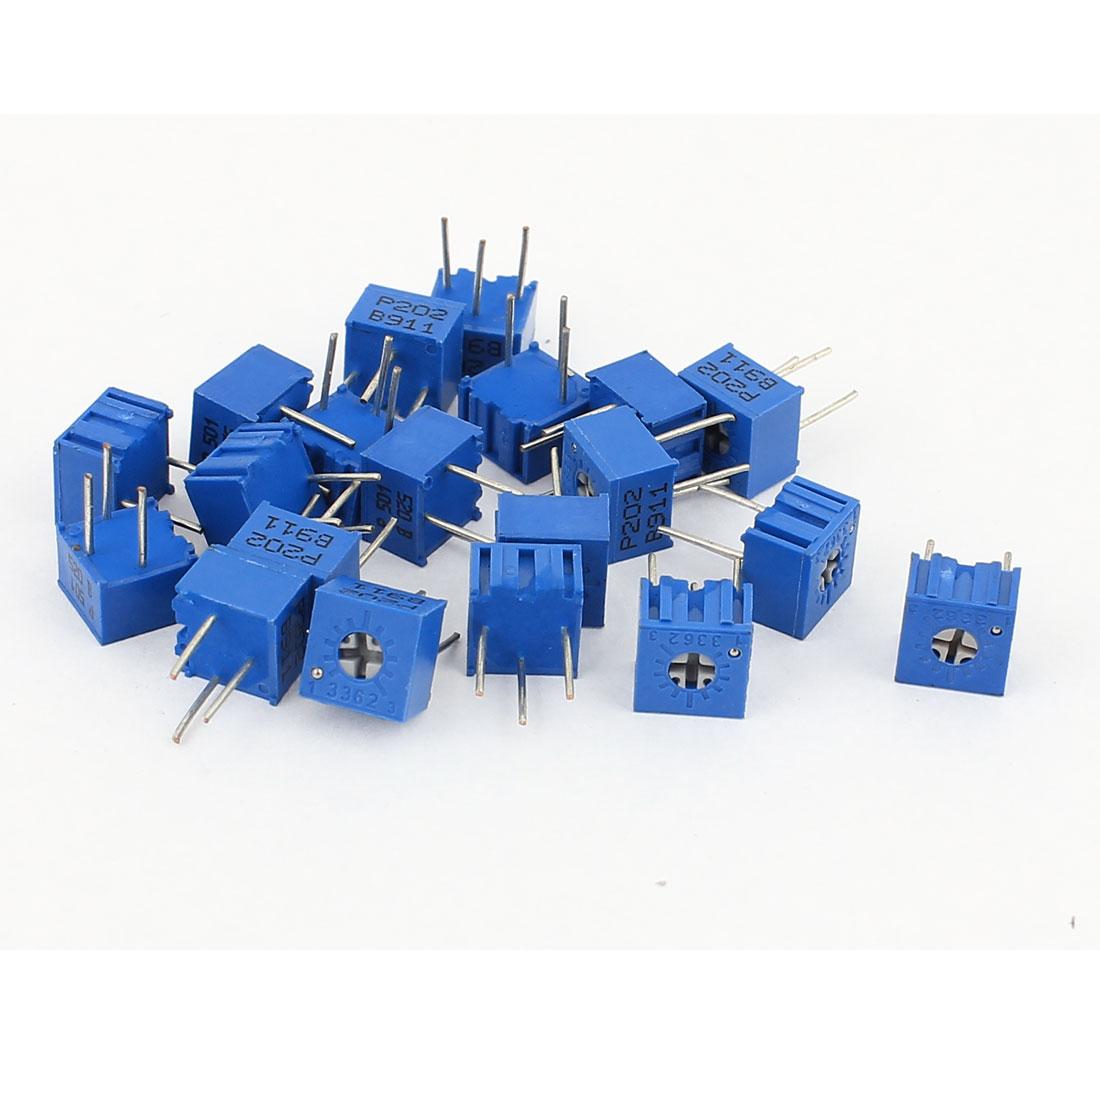 20Pcs Potentiometer Trimmer Variable Resistor 3362P-501 3362P-202